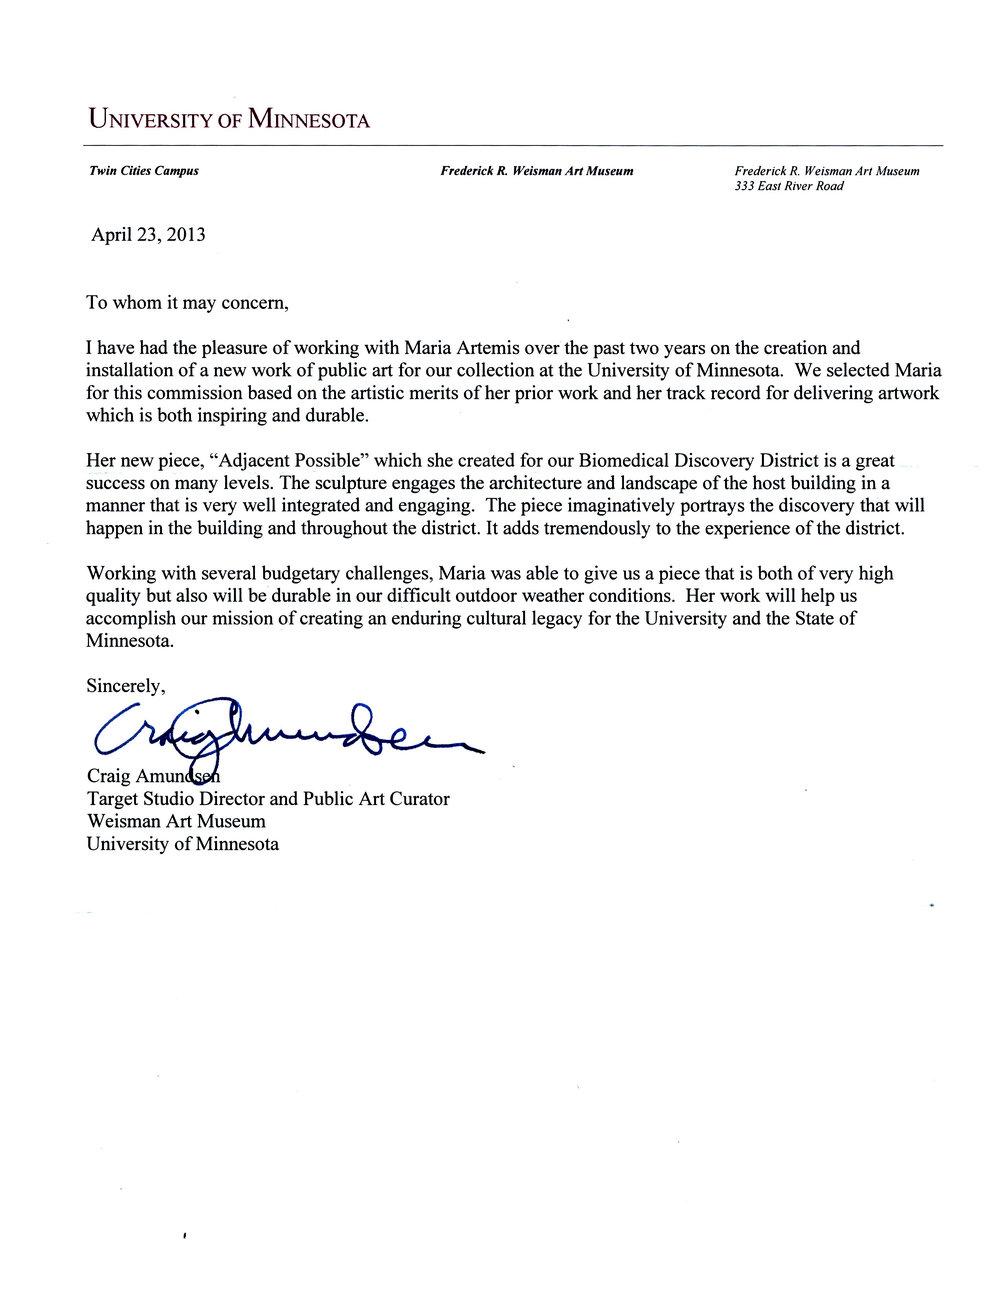 Craig Amundsen Letter of Recommendation